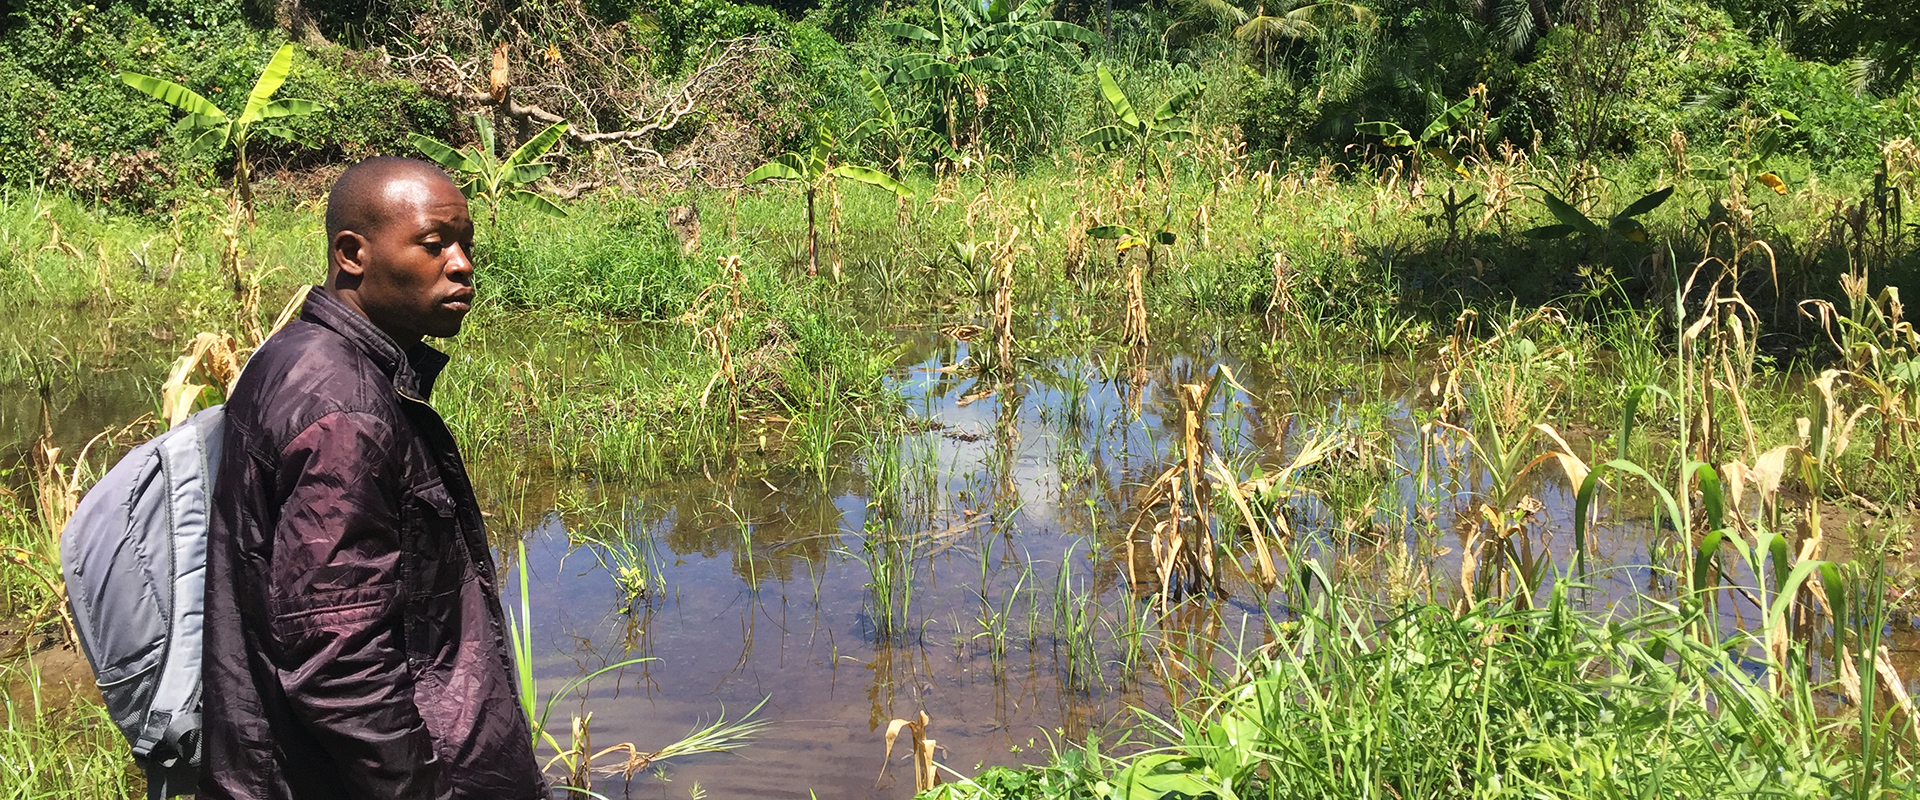 emergenza ciclone idai alluvione mozambico mani tese 2019